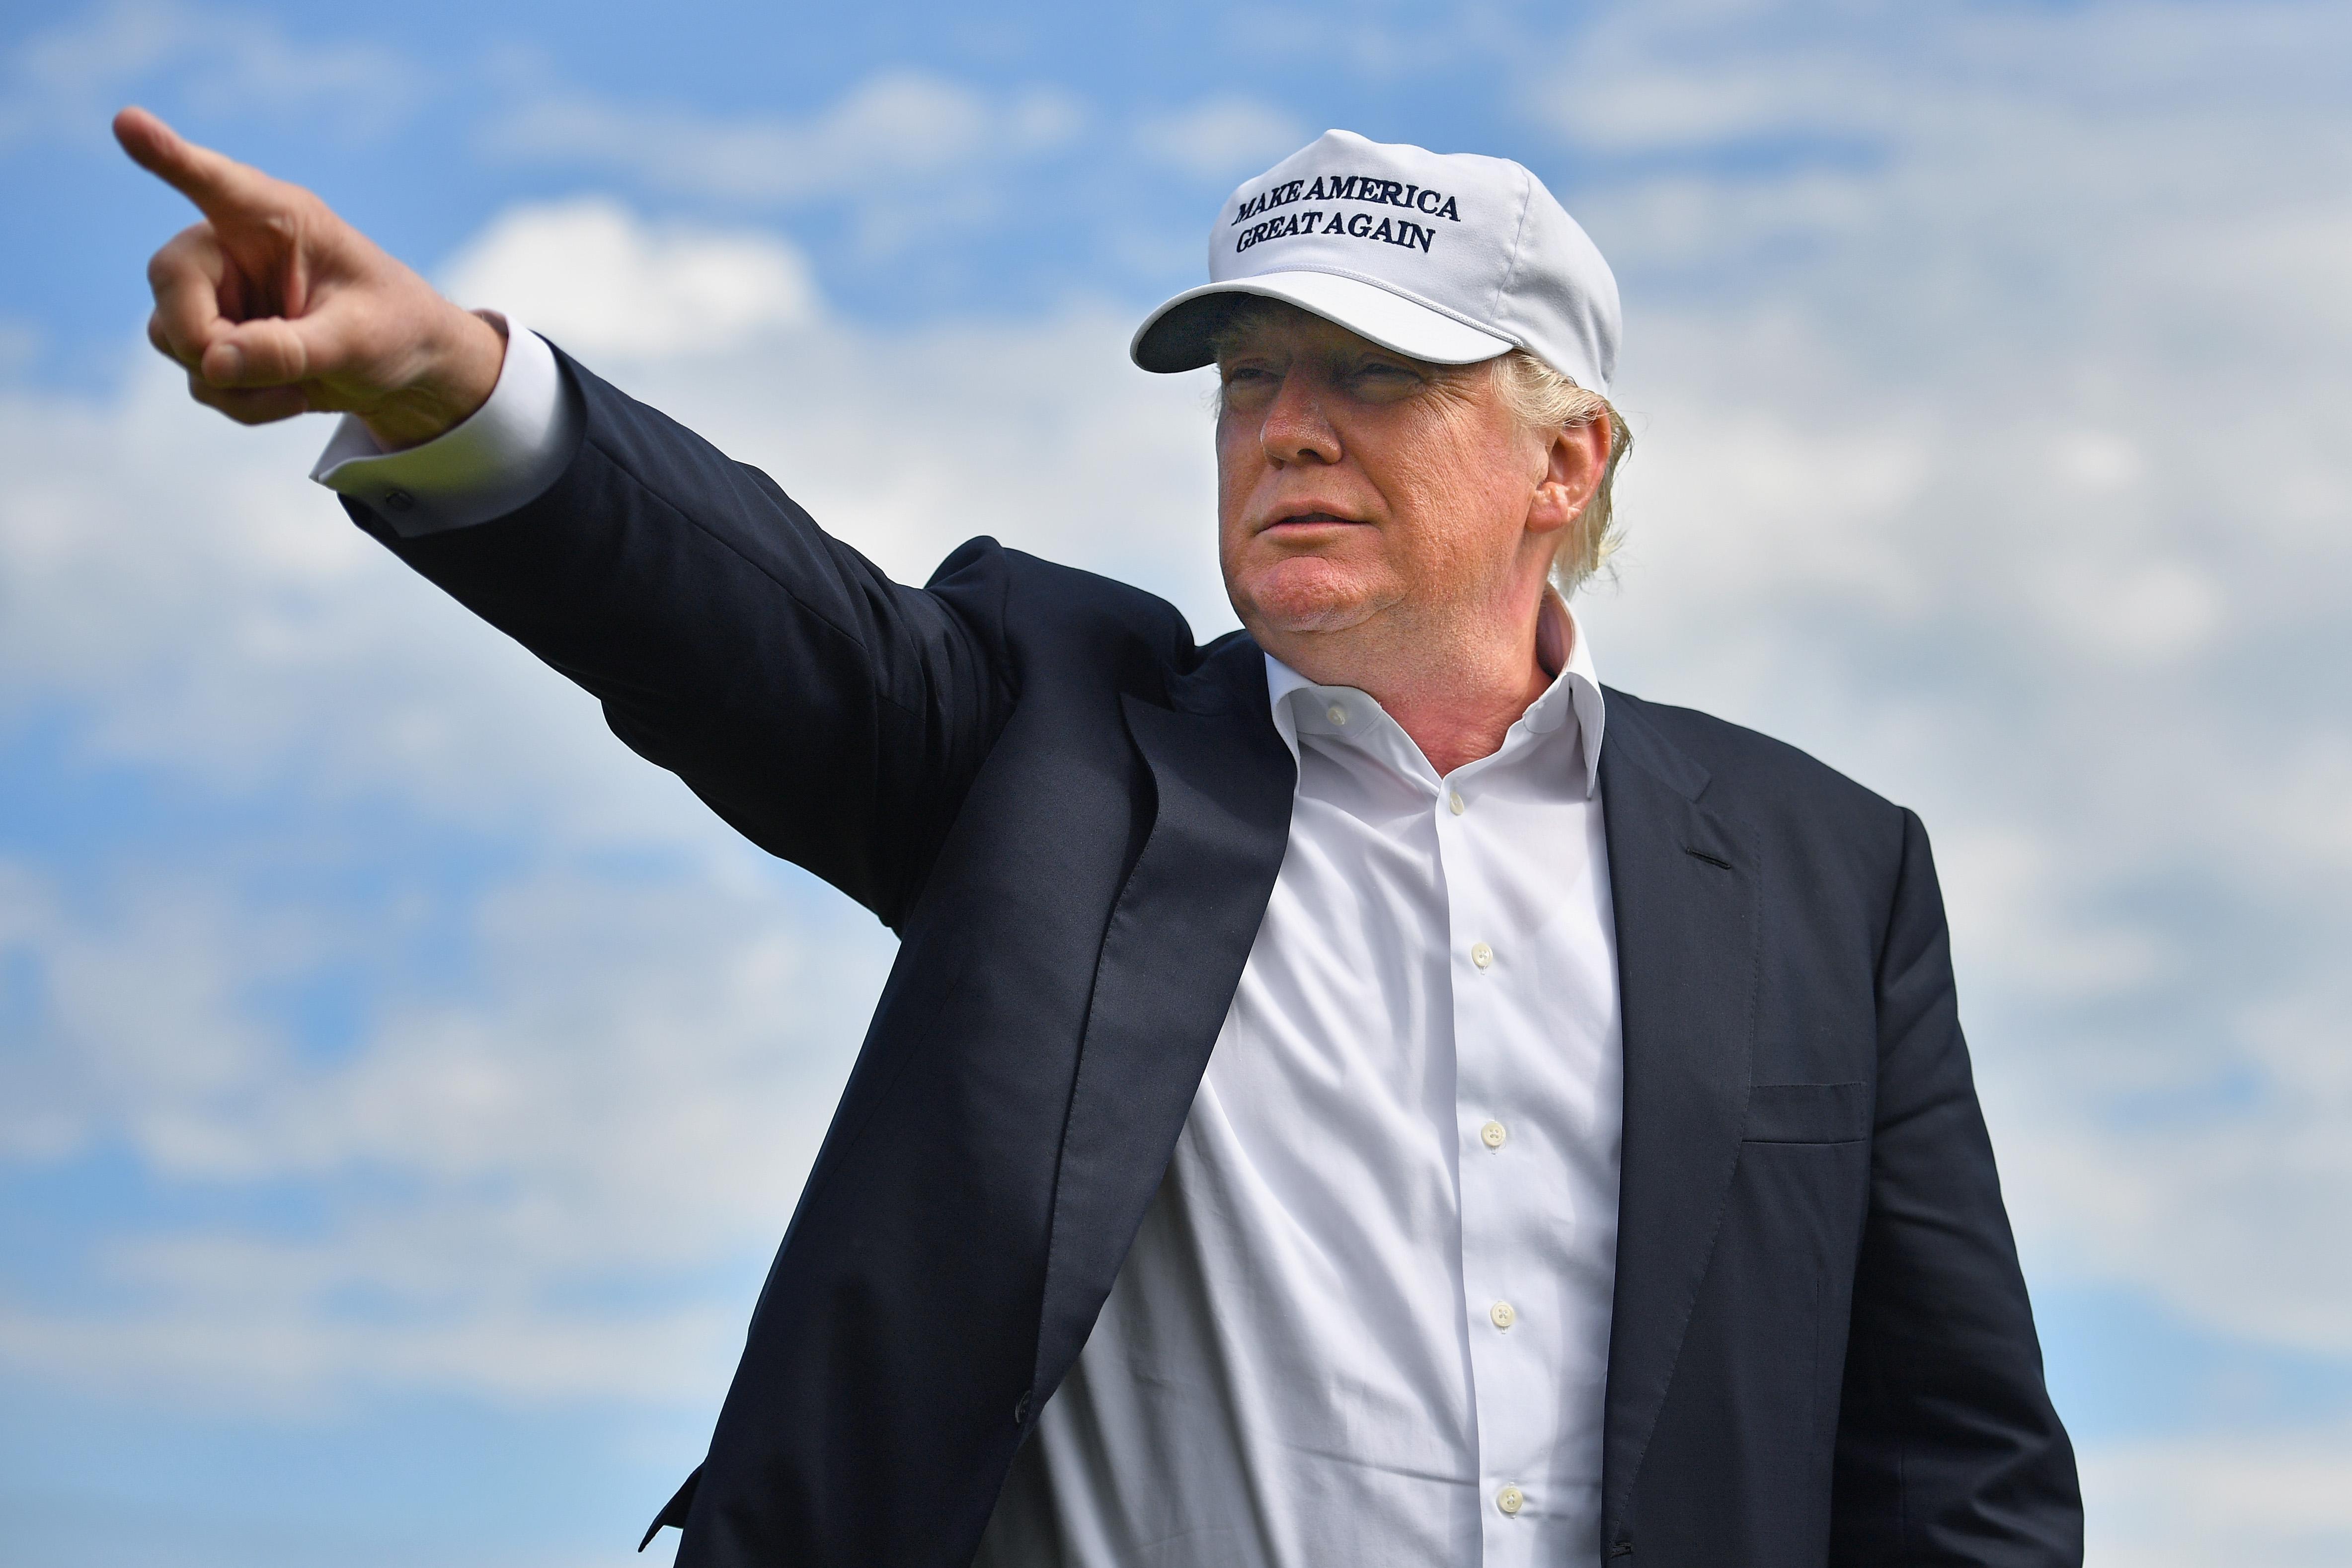 Donald Trump visits Trump International Golf Links on June 25, 2016 in Aberdeen, Scotland.